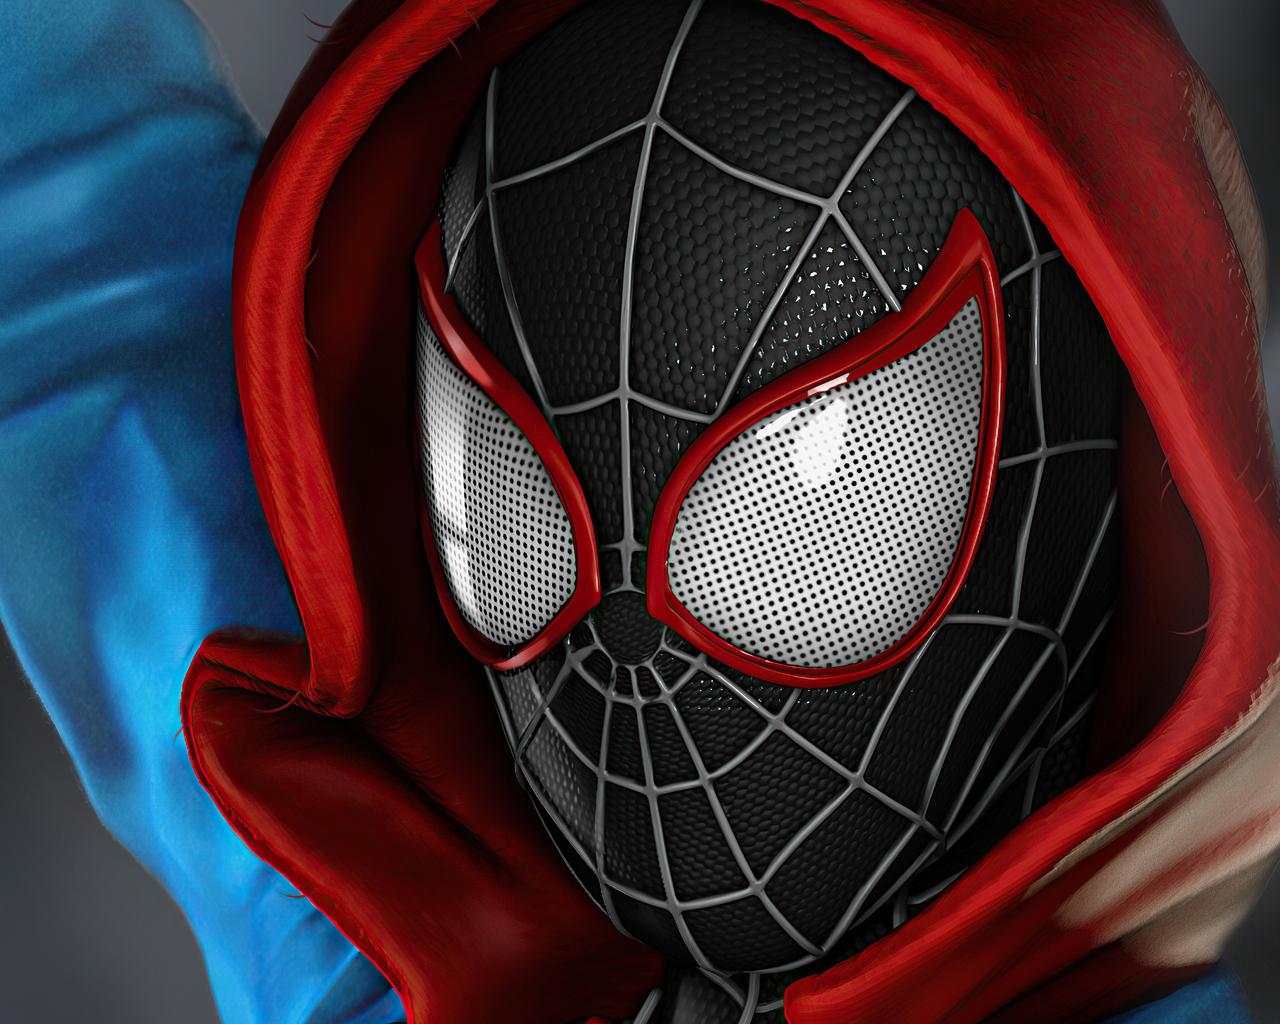 spider-man-miles-morales-costume-4k-3j.jpg